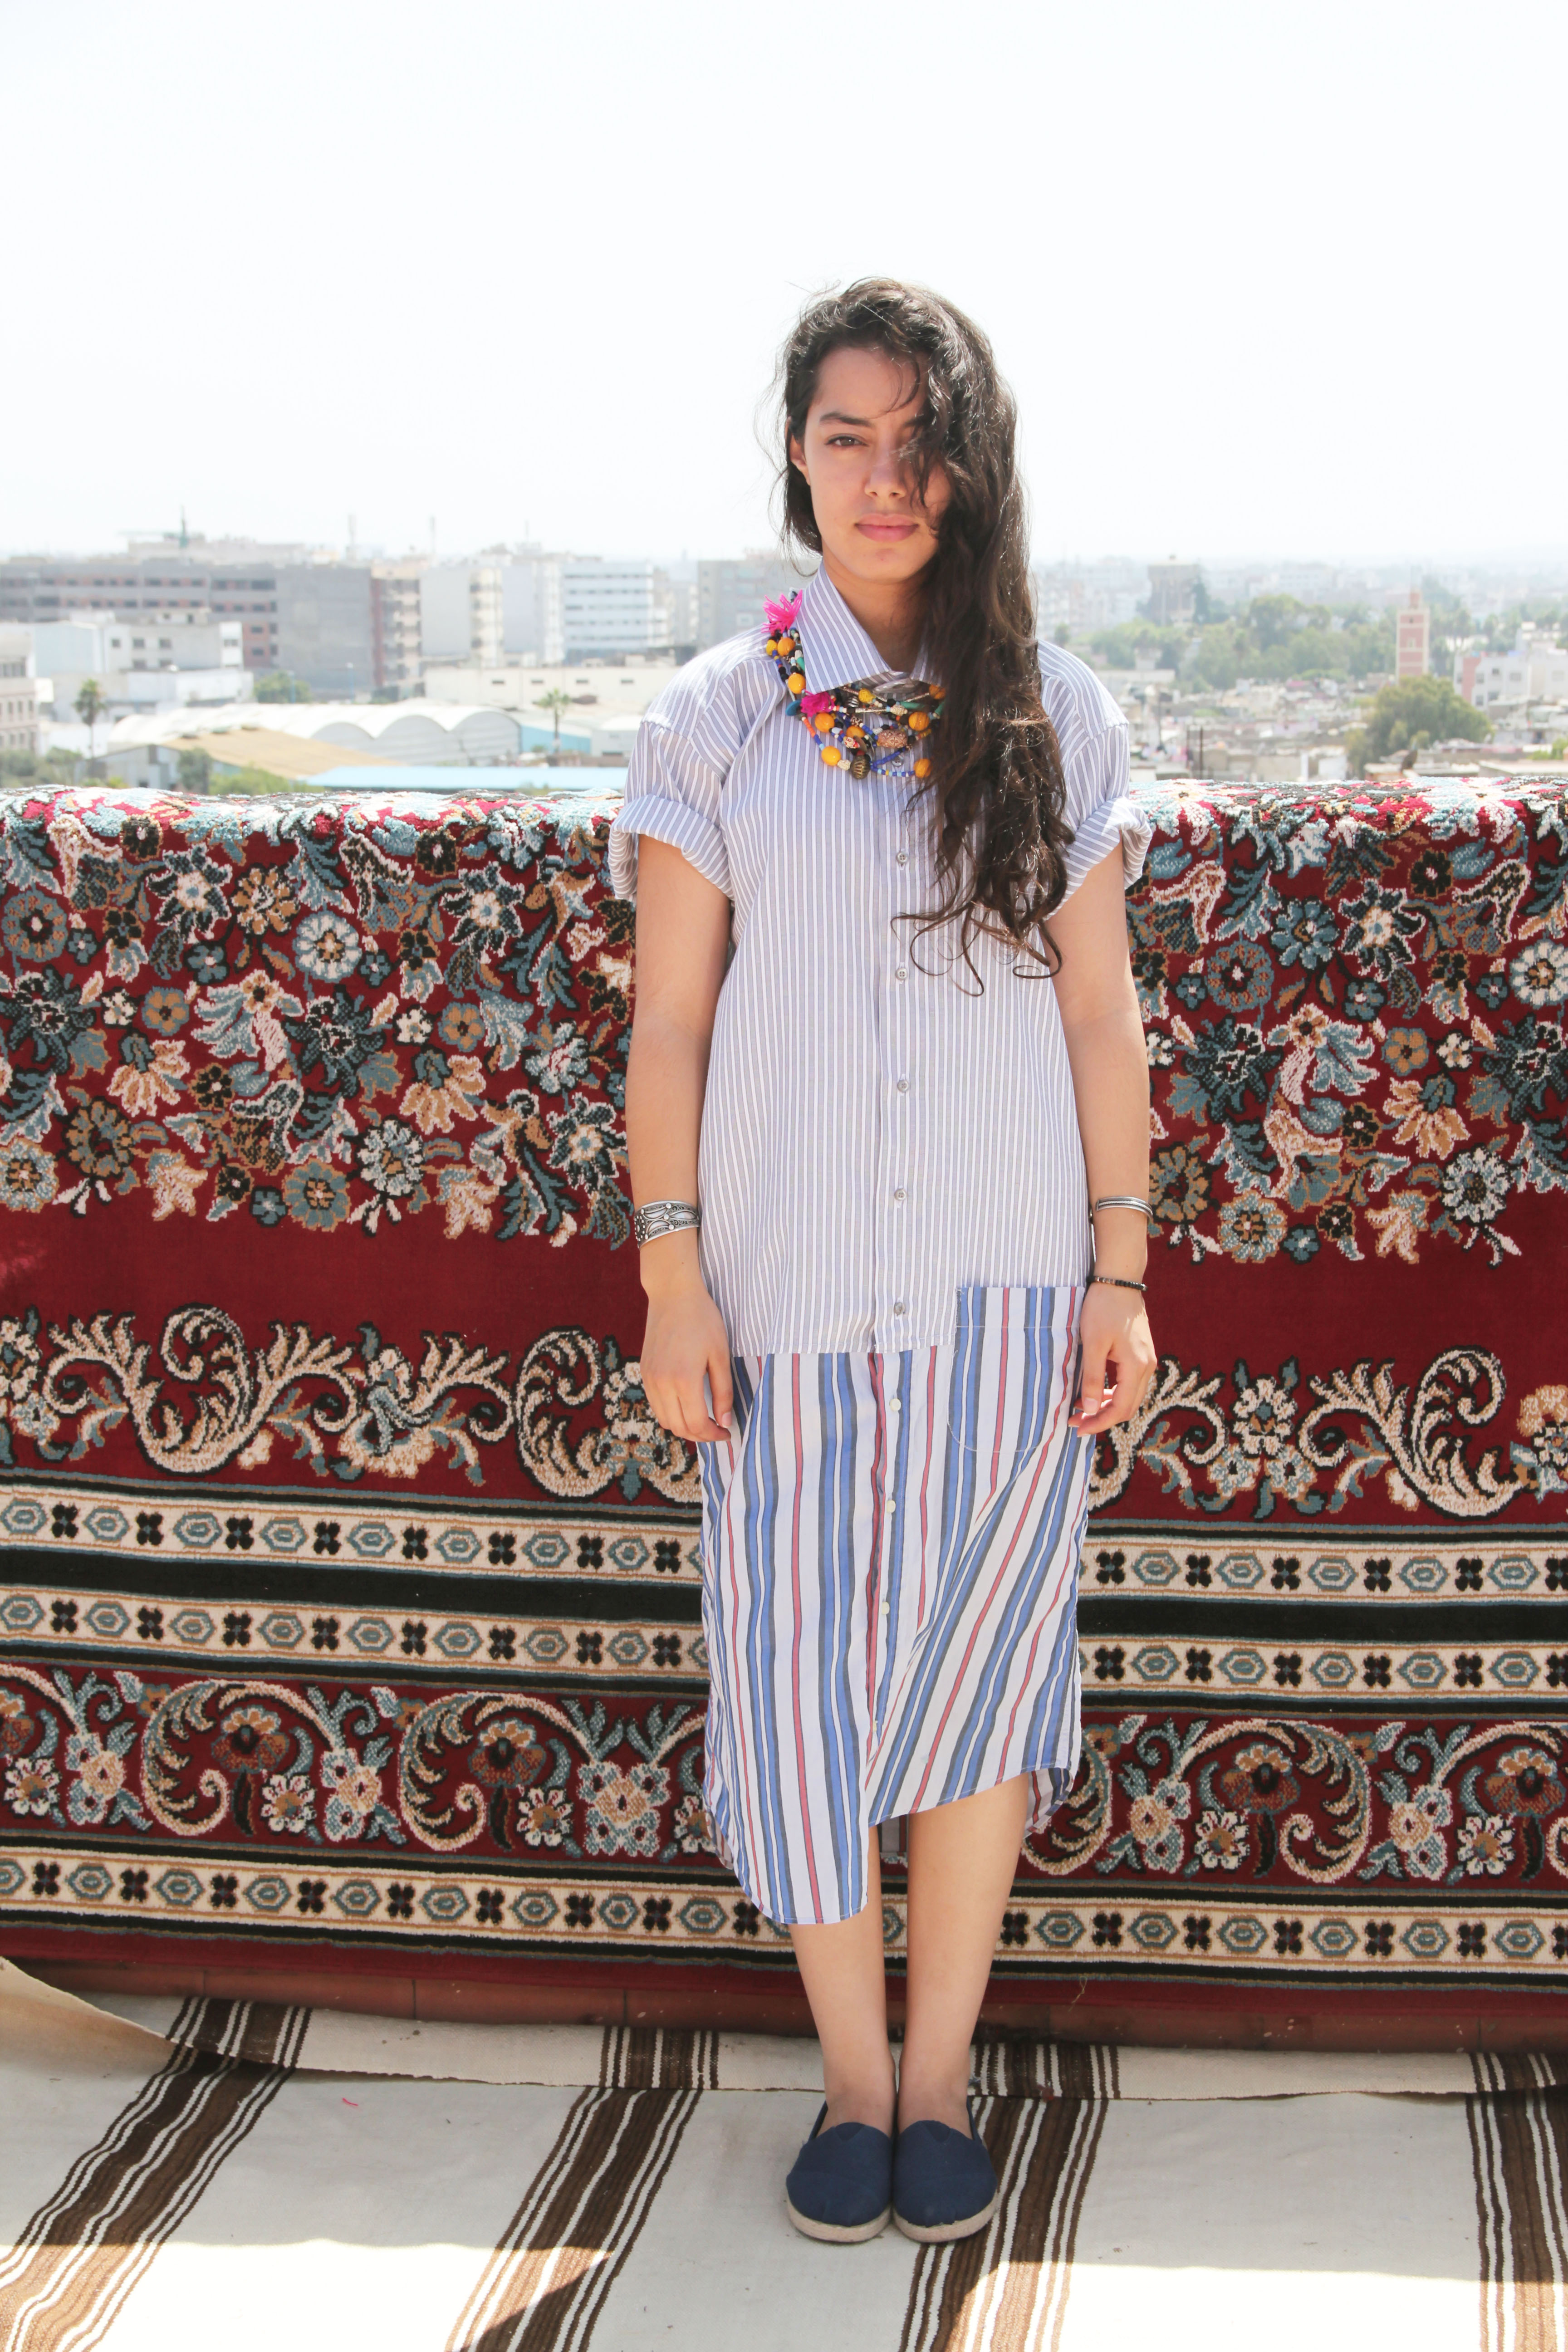 Ghitta Laskrouif, Vintage & Slow Fashion